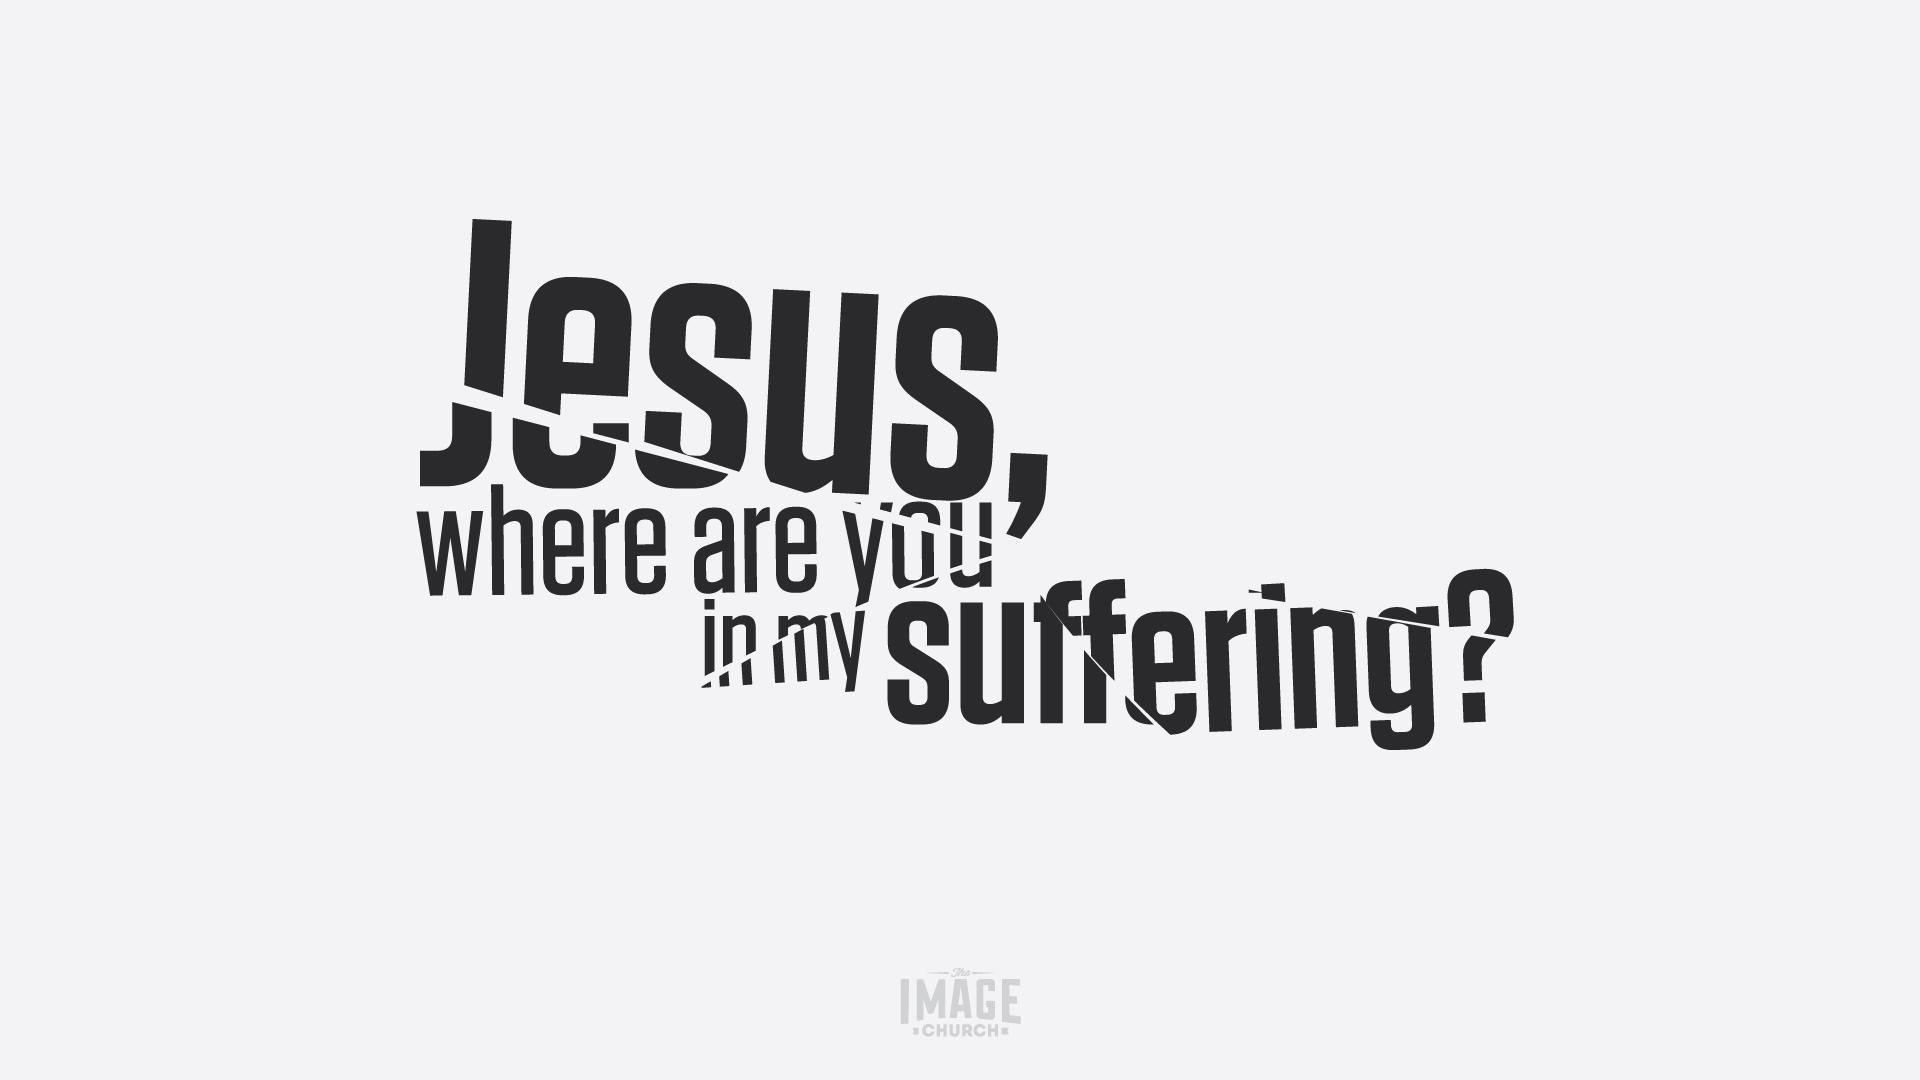 Suffering_slide.jpg